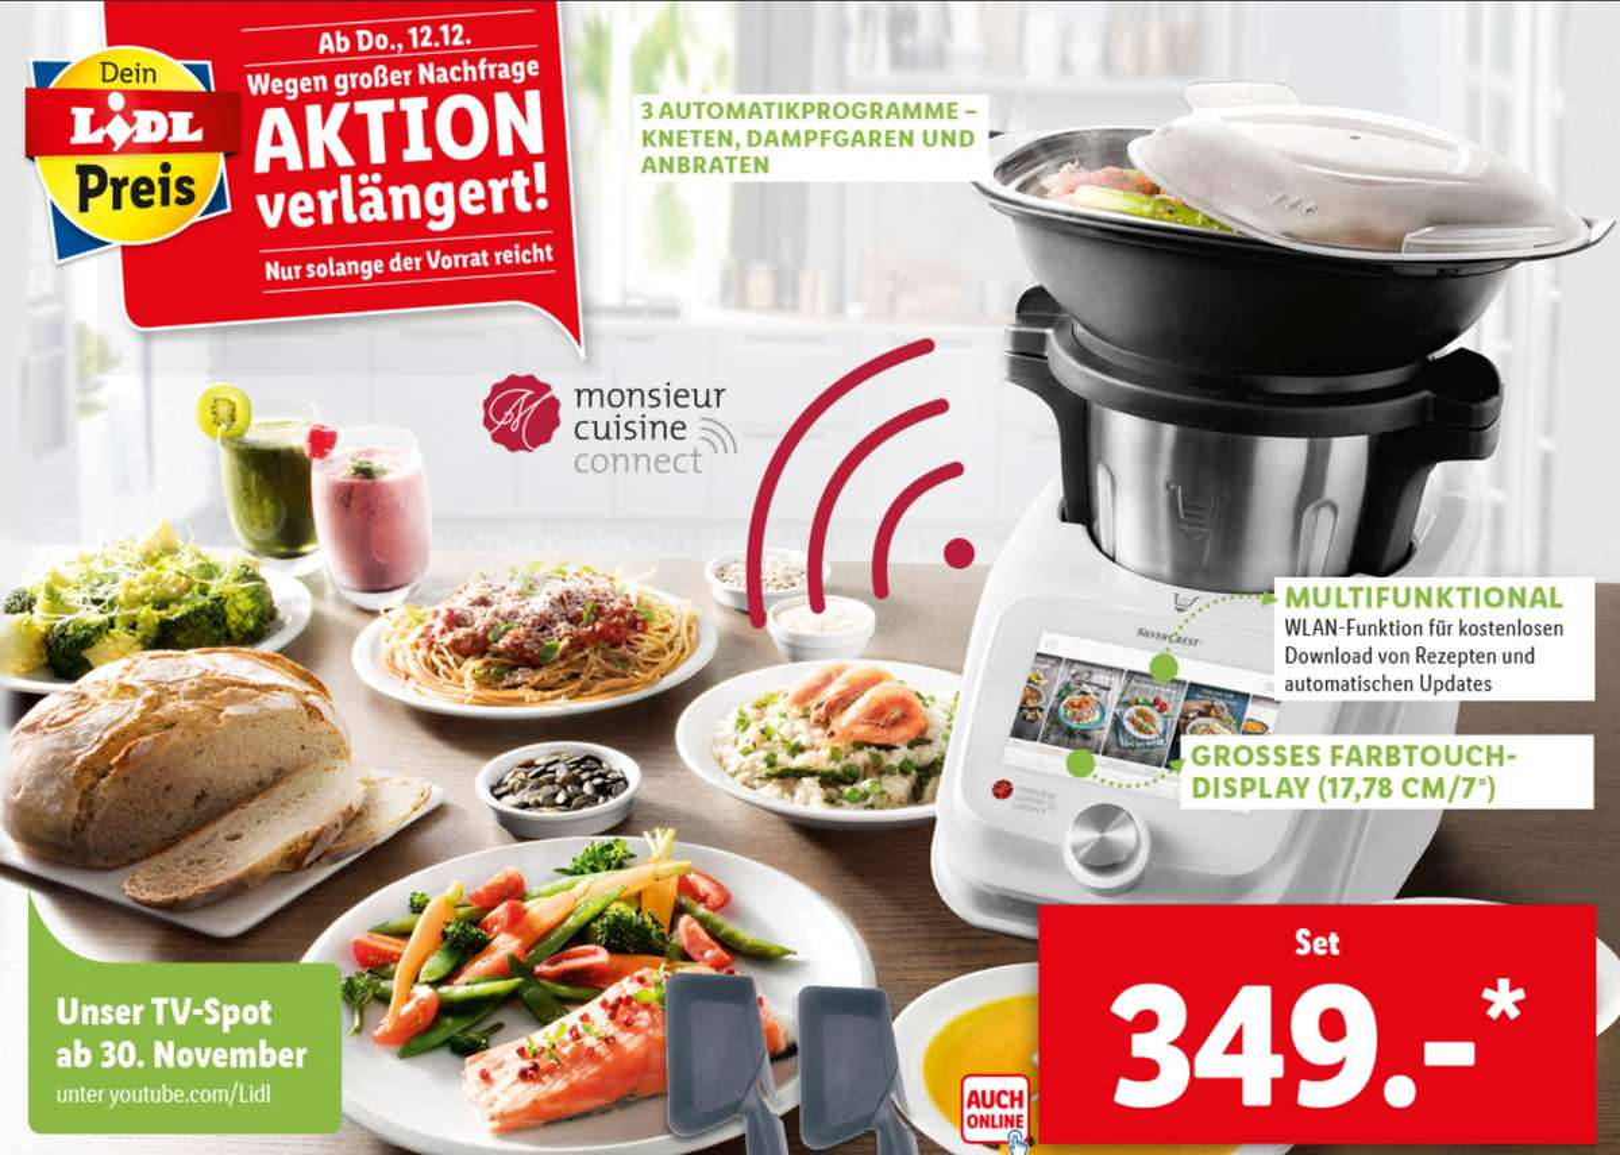 Thermomix Alternative Monsieur Cuisine Connect Kuchenmaschine Ab